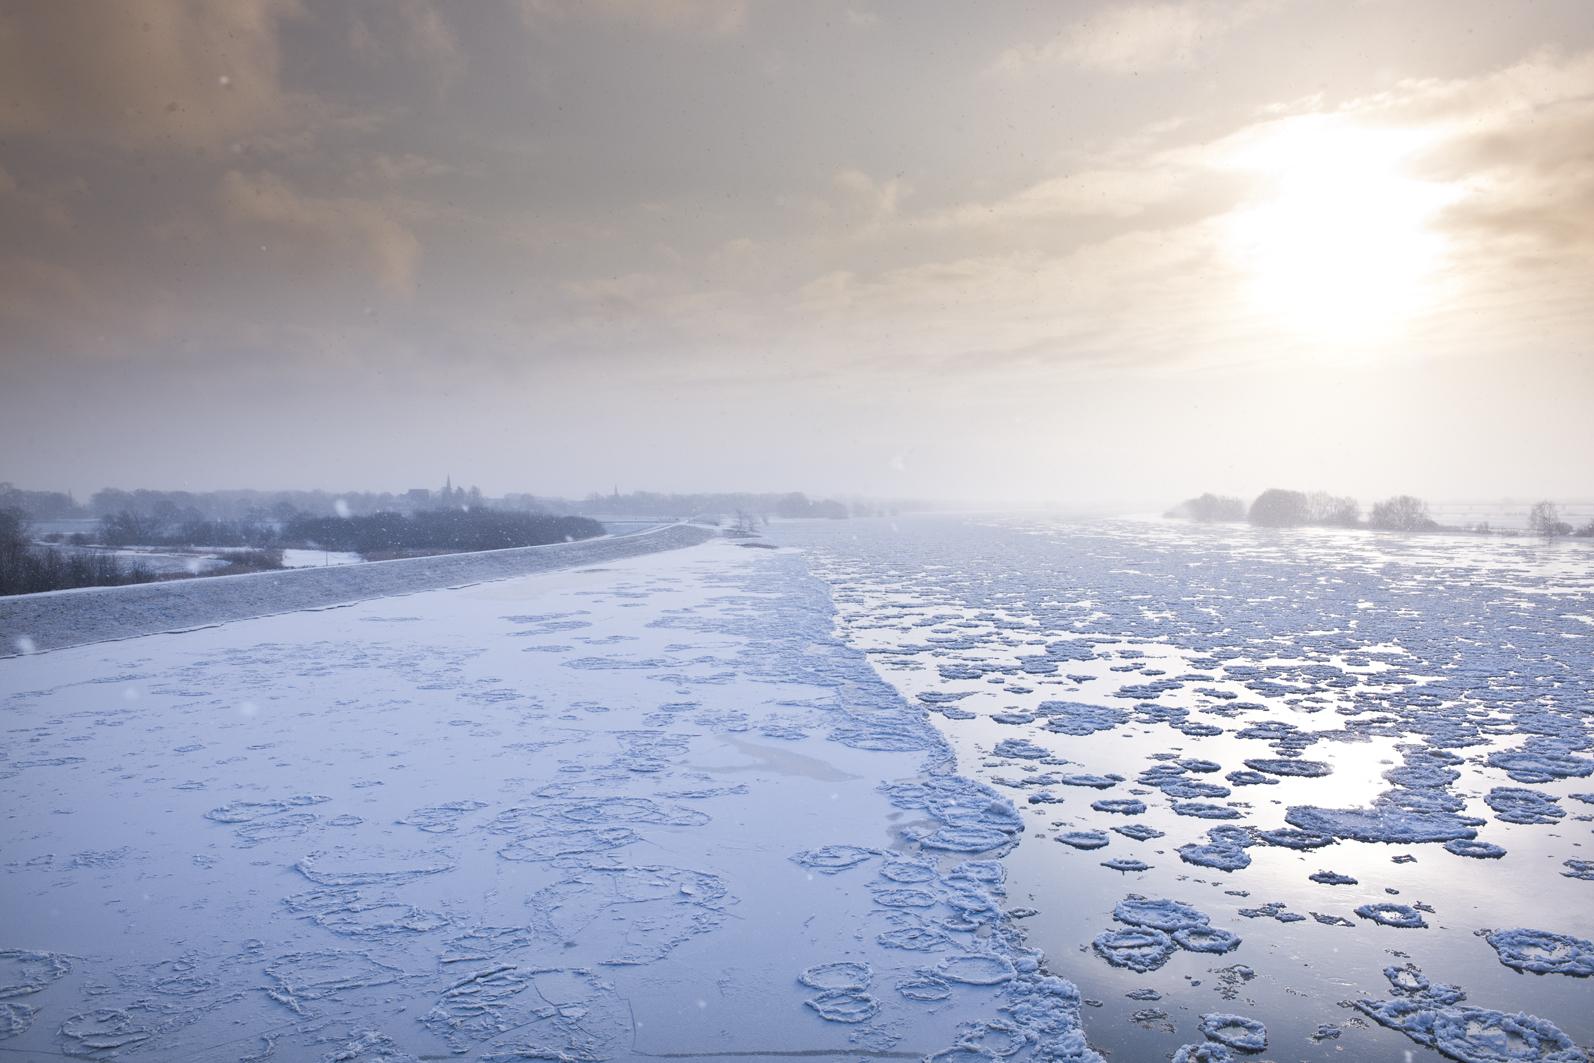 Dömitz_Mecklenburgisches_Elbetal_Elbe_Winter_Schnee_Eis-1614